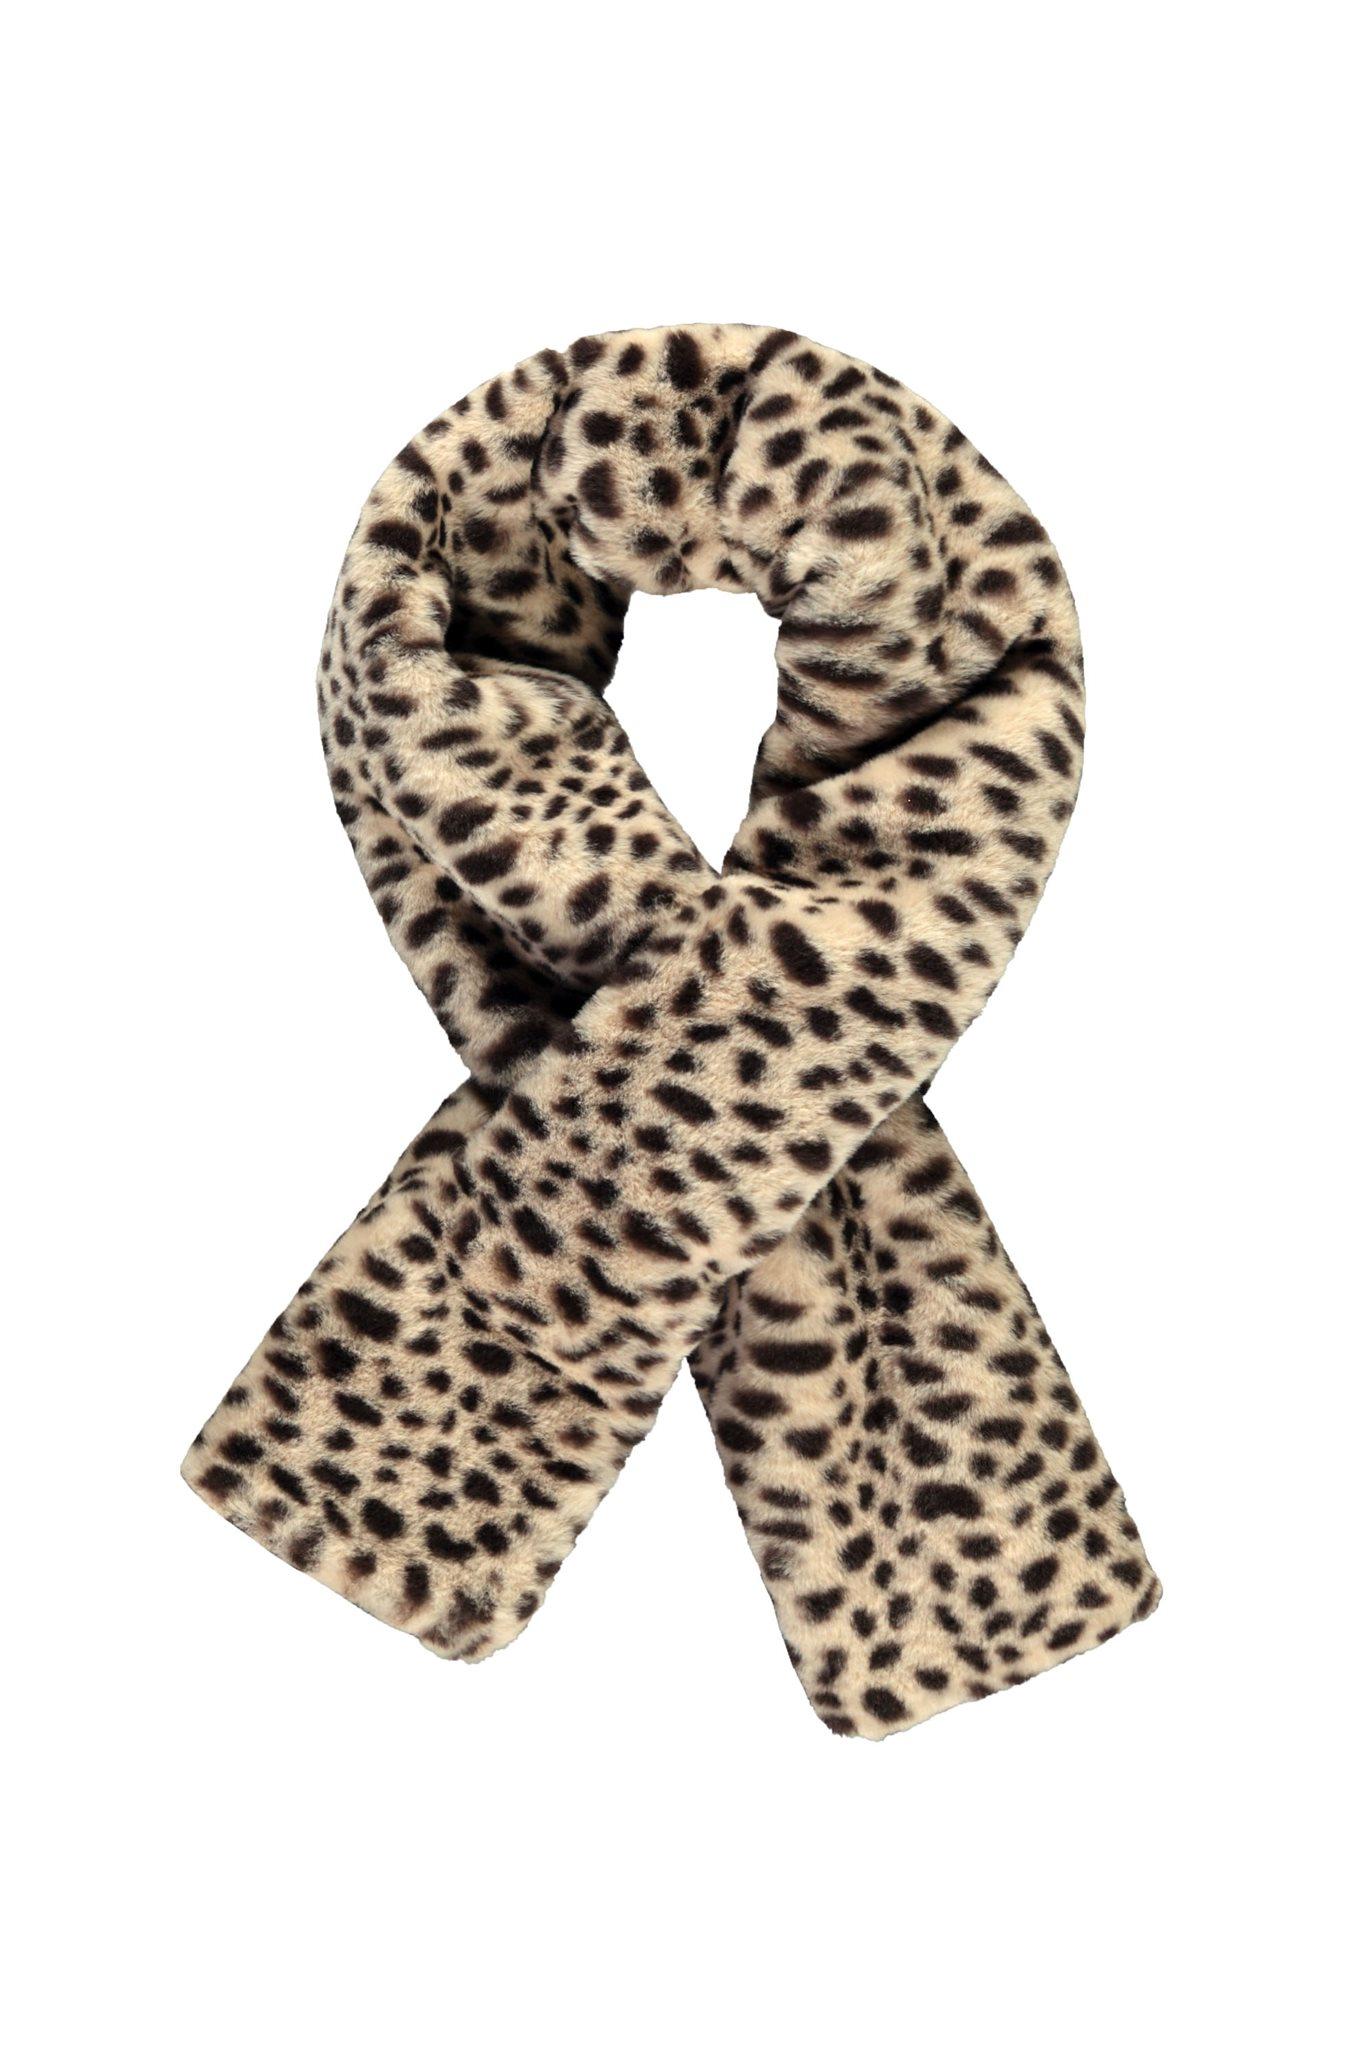 Flo baby panter sjaal